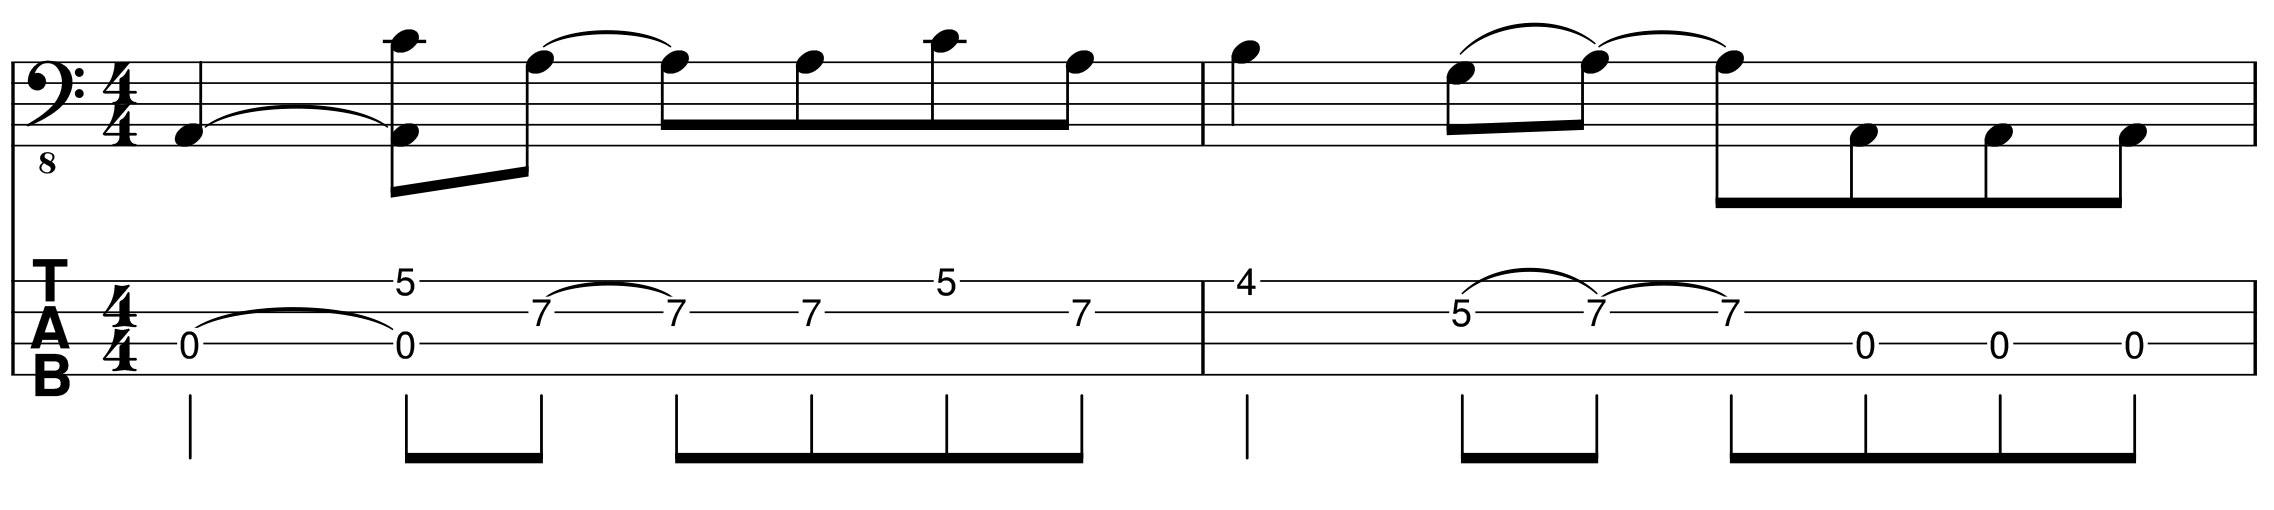 Bass-lernen-für-Anfänger-Bassline-2_1